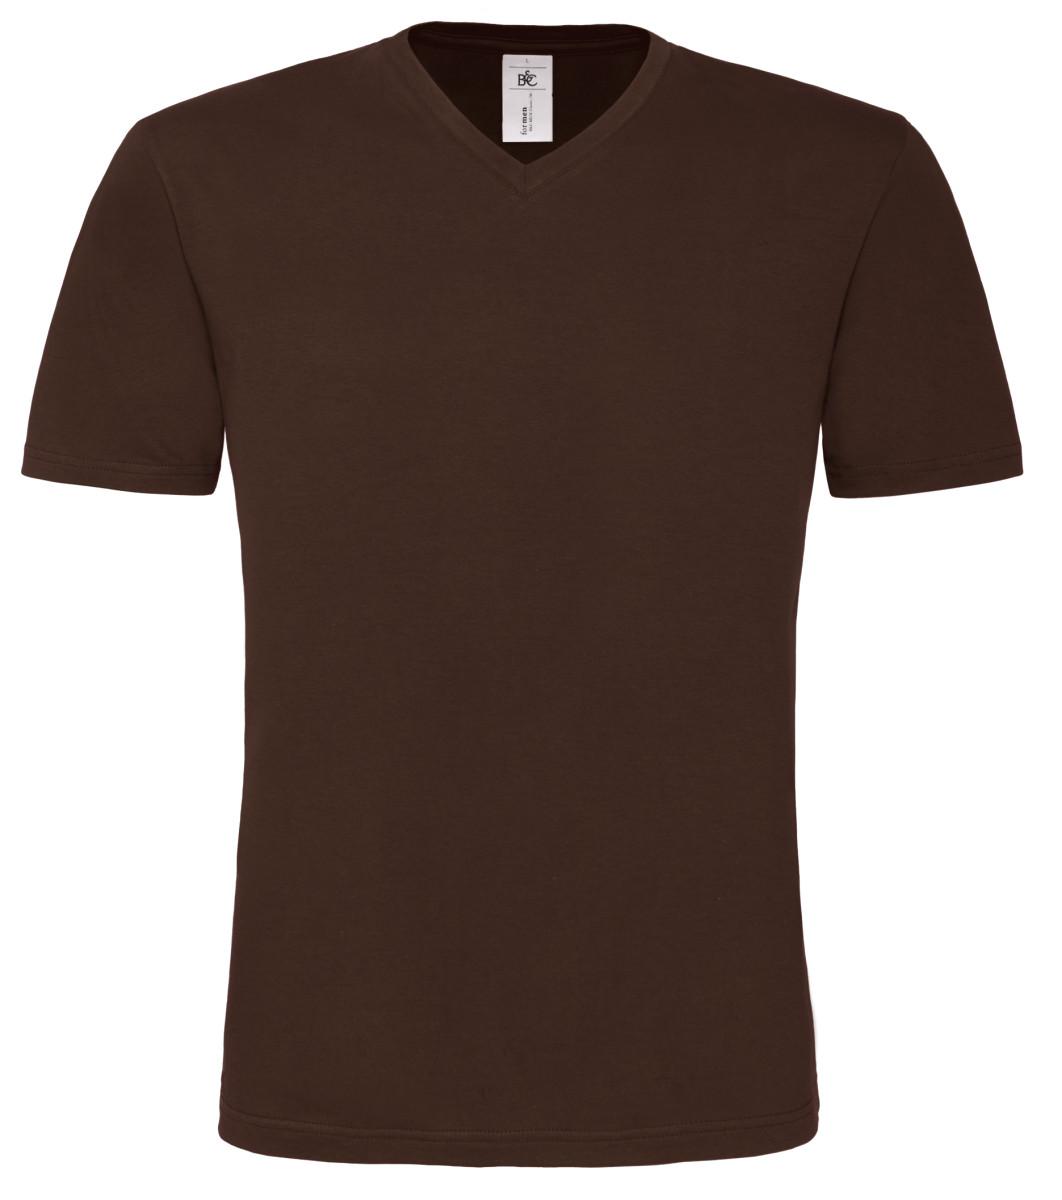 B&C Mens Mick Classic T-Shirt